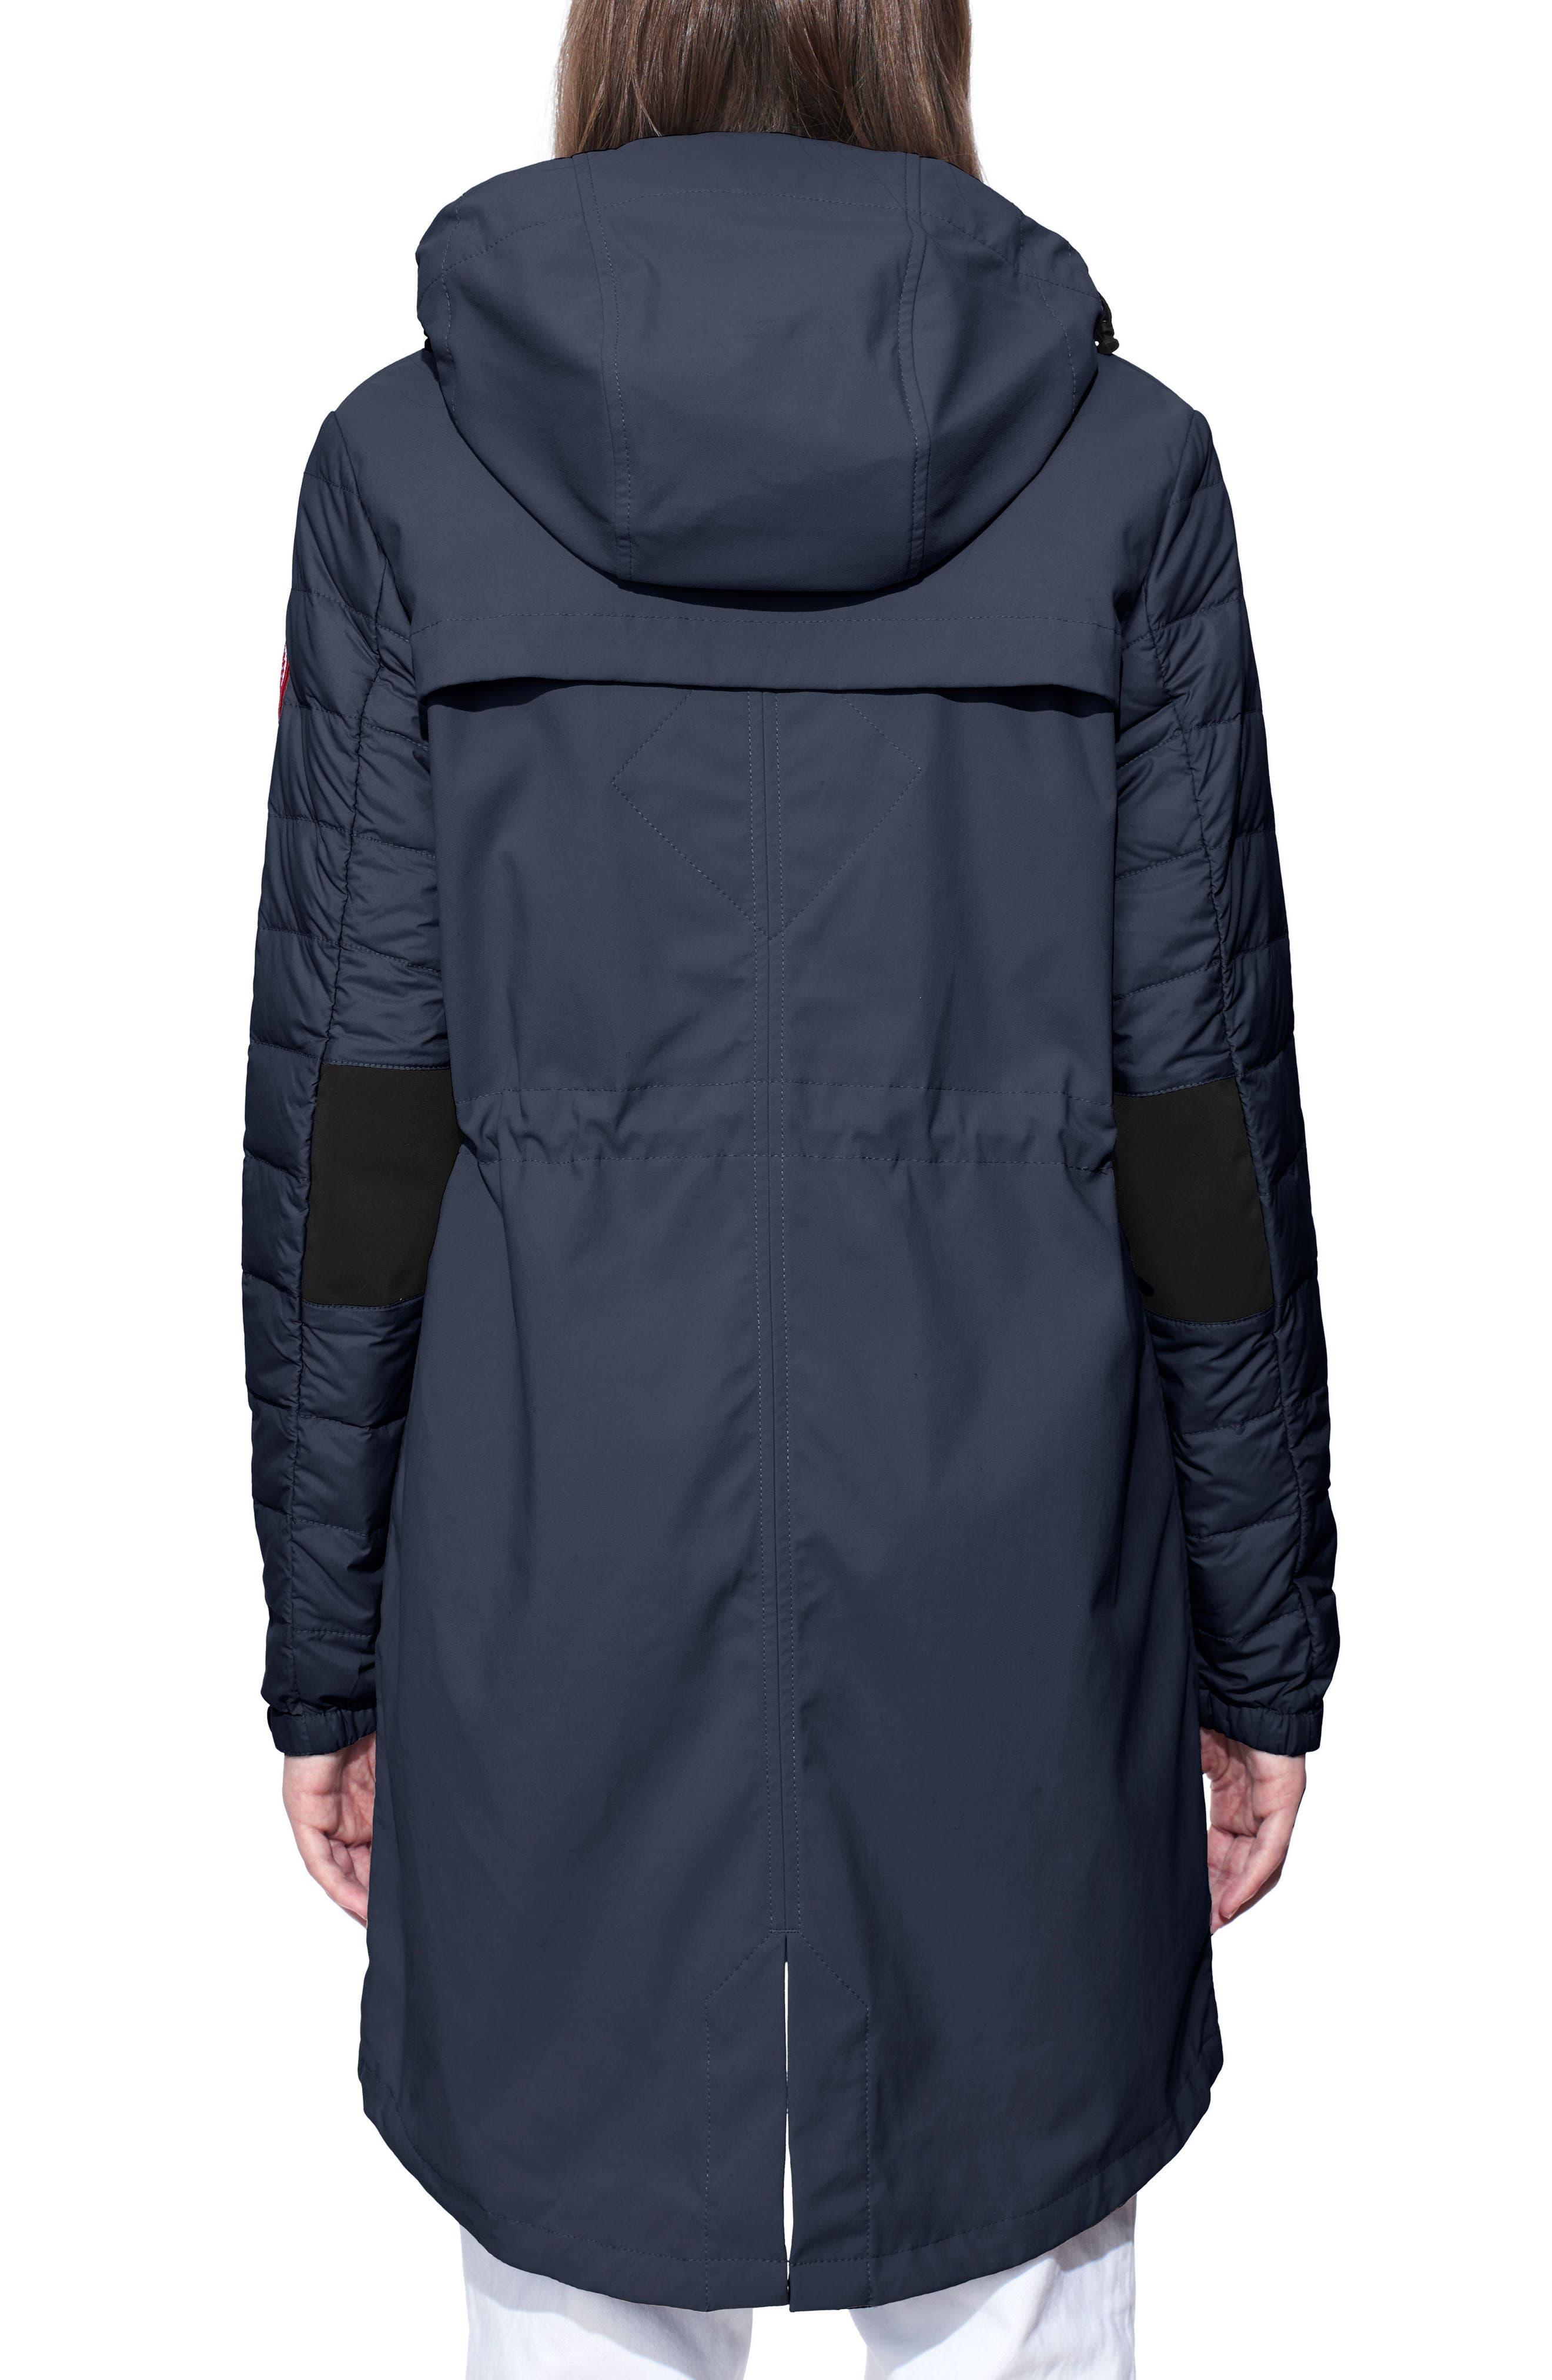 Sabine Coat,                             Alternate thumbnail 2, color,                             Polar Sea/ Black